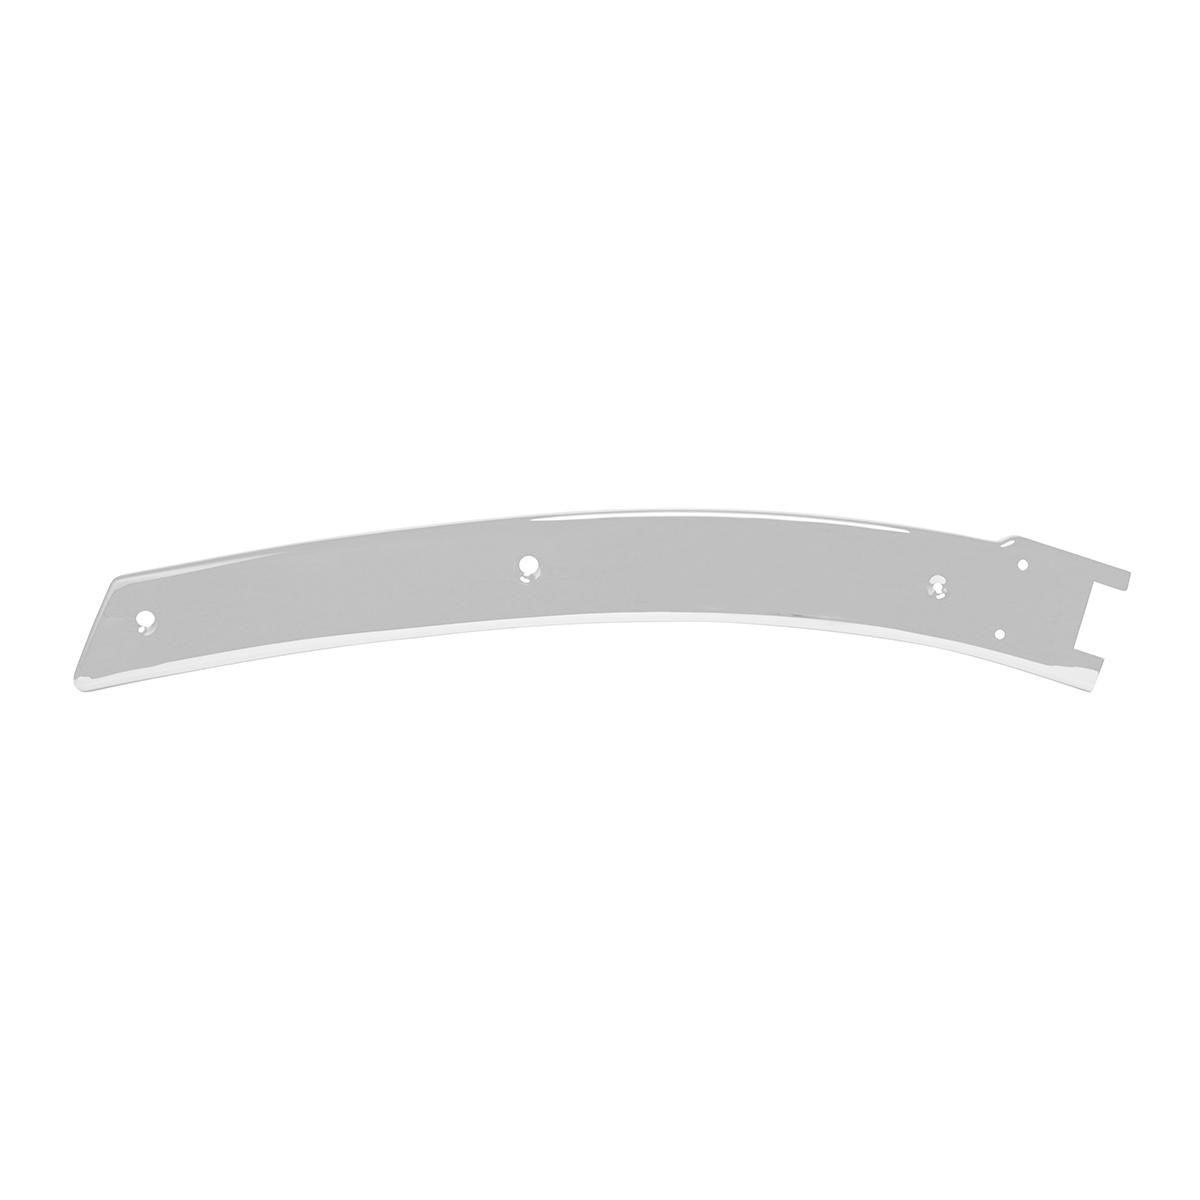 52010 KW Chrome Plastic Headliner Trim